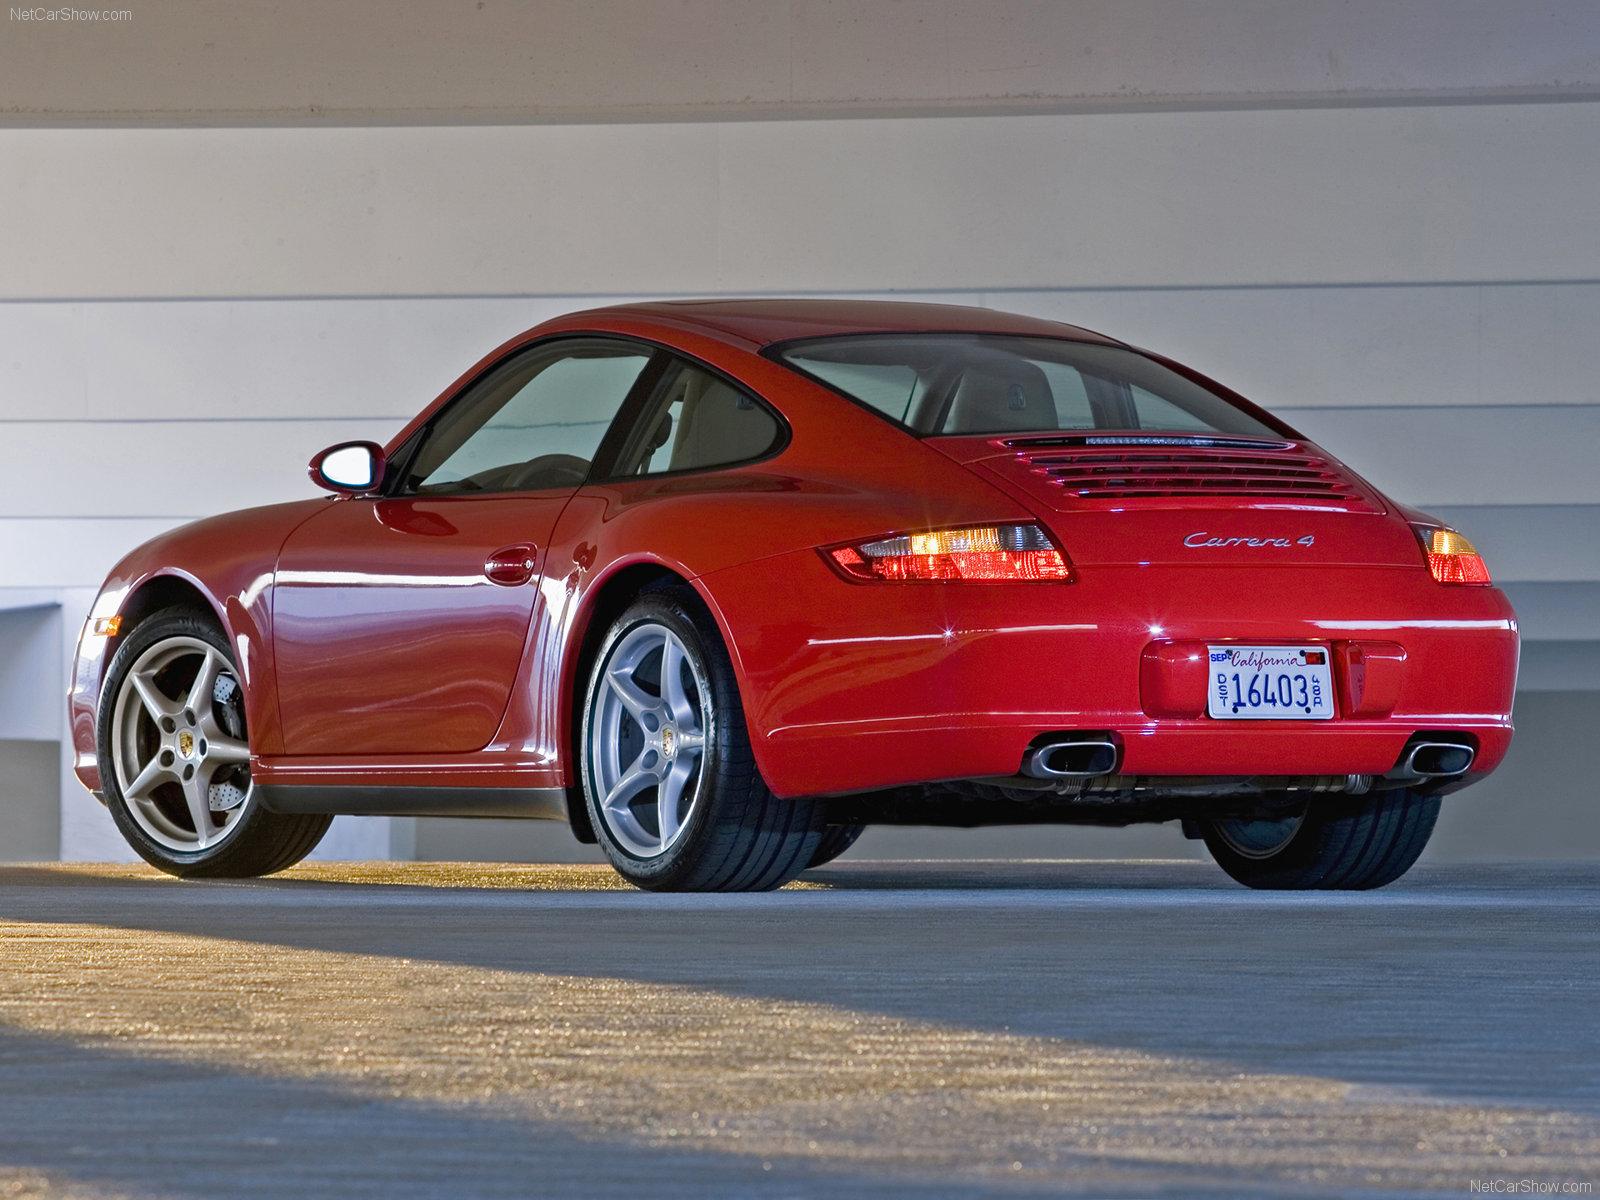 Porsche 911 Gts For Sale >> 2007 Red Porsche 911 Carrera 4 wallpapers